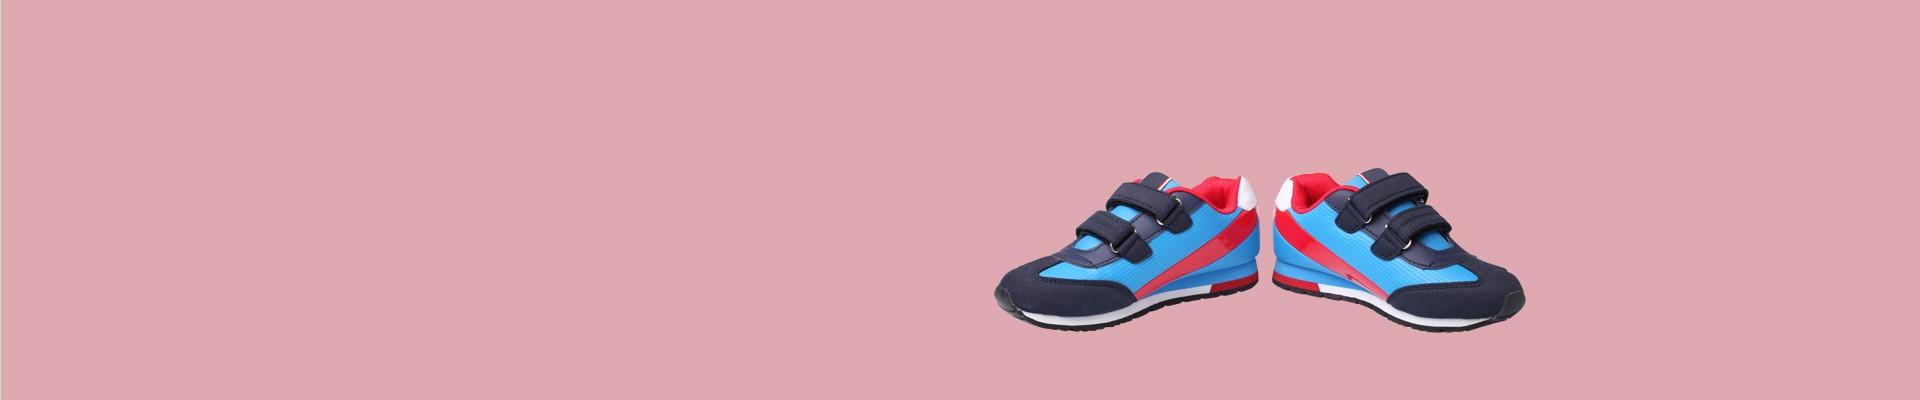 Jual Sneakers Anak Laki-Laki Anak Laki Laki Terbaru 2019